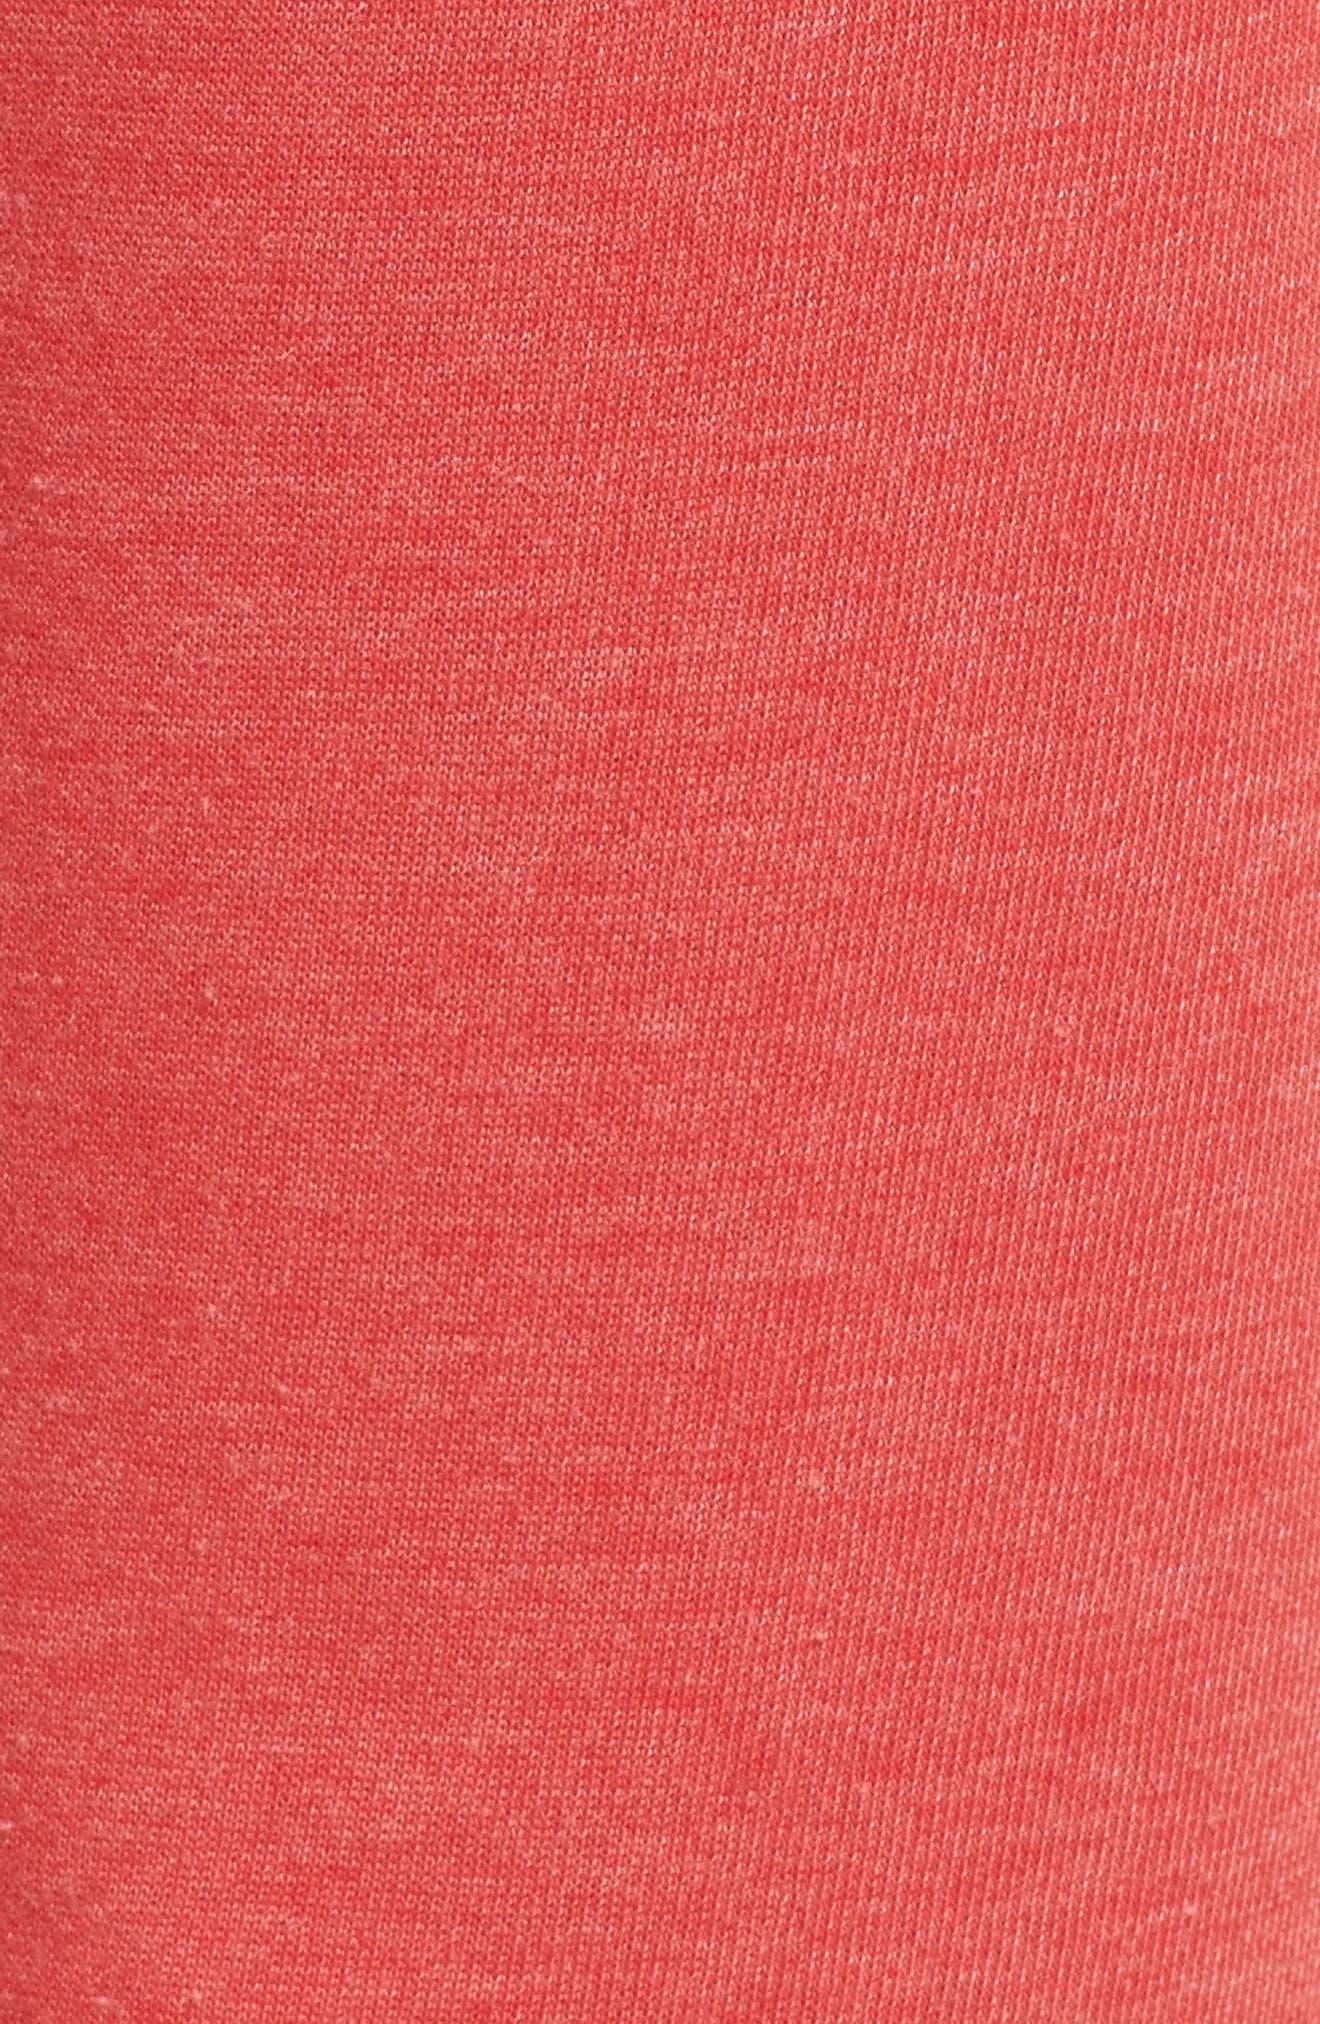 Long Weekend Lounge Jogger Pants,                             Alternate thumbnail 7, color,                             Red Bloom/ Dark Navy/ Blue